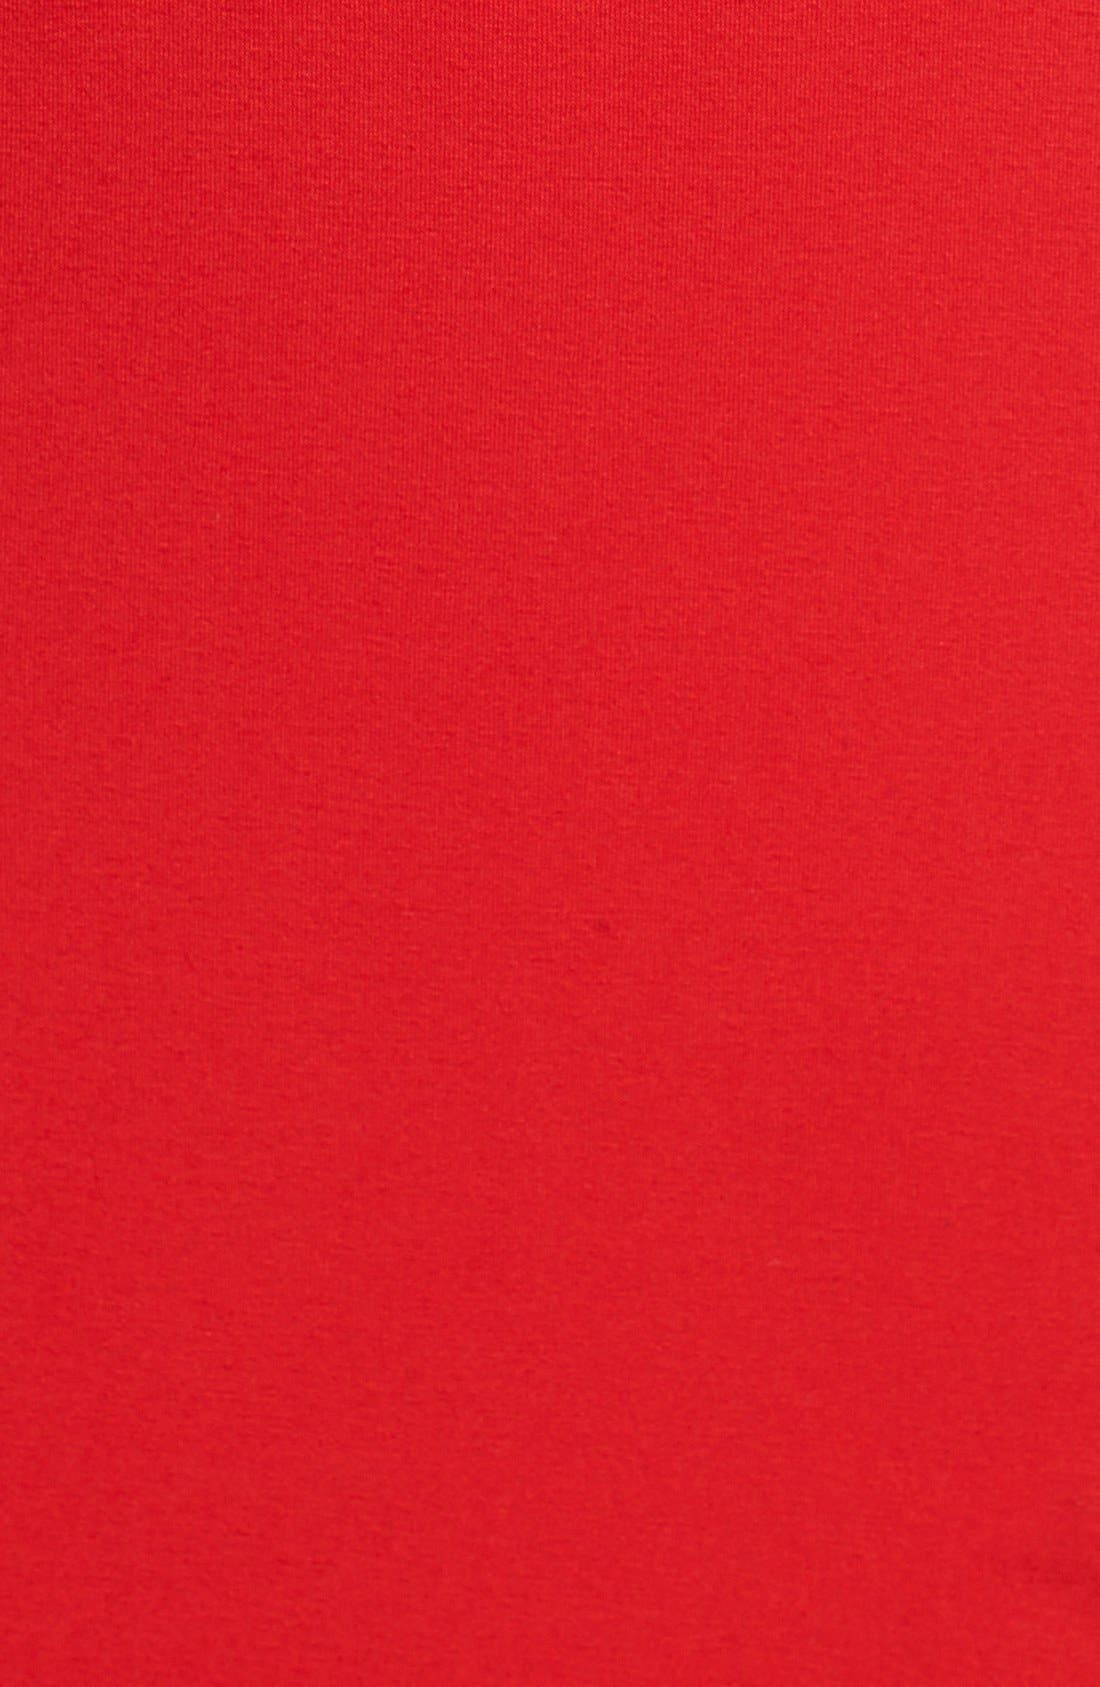 Alternate Image 3  - Vince Camuto Mesh Insert Maxi Dress